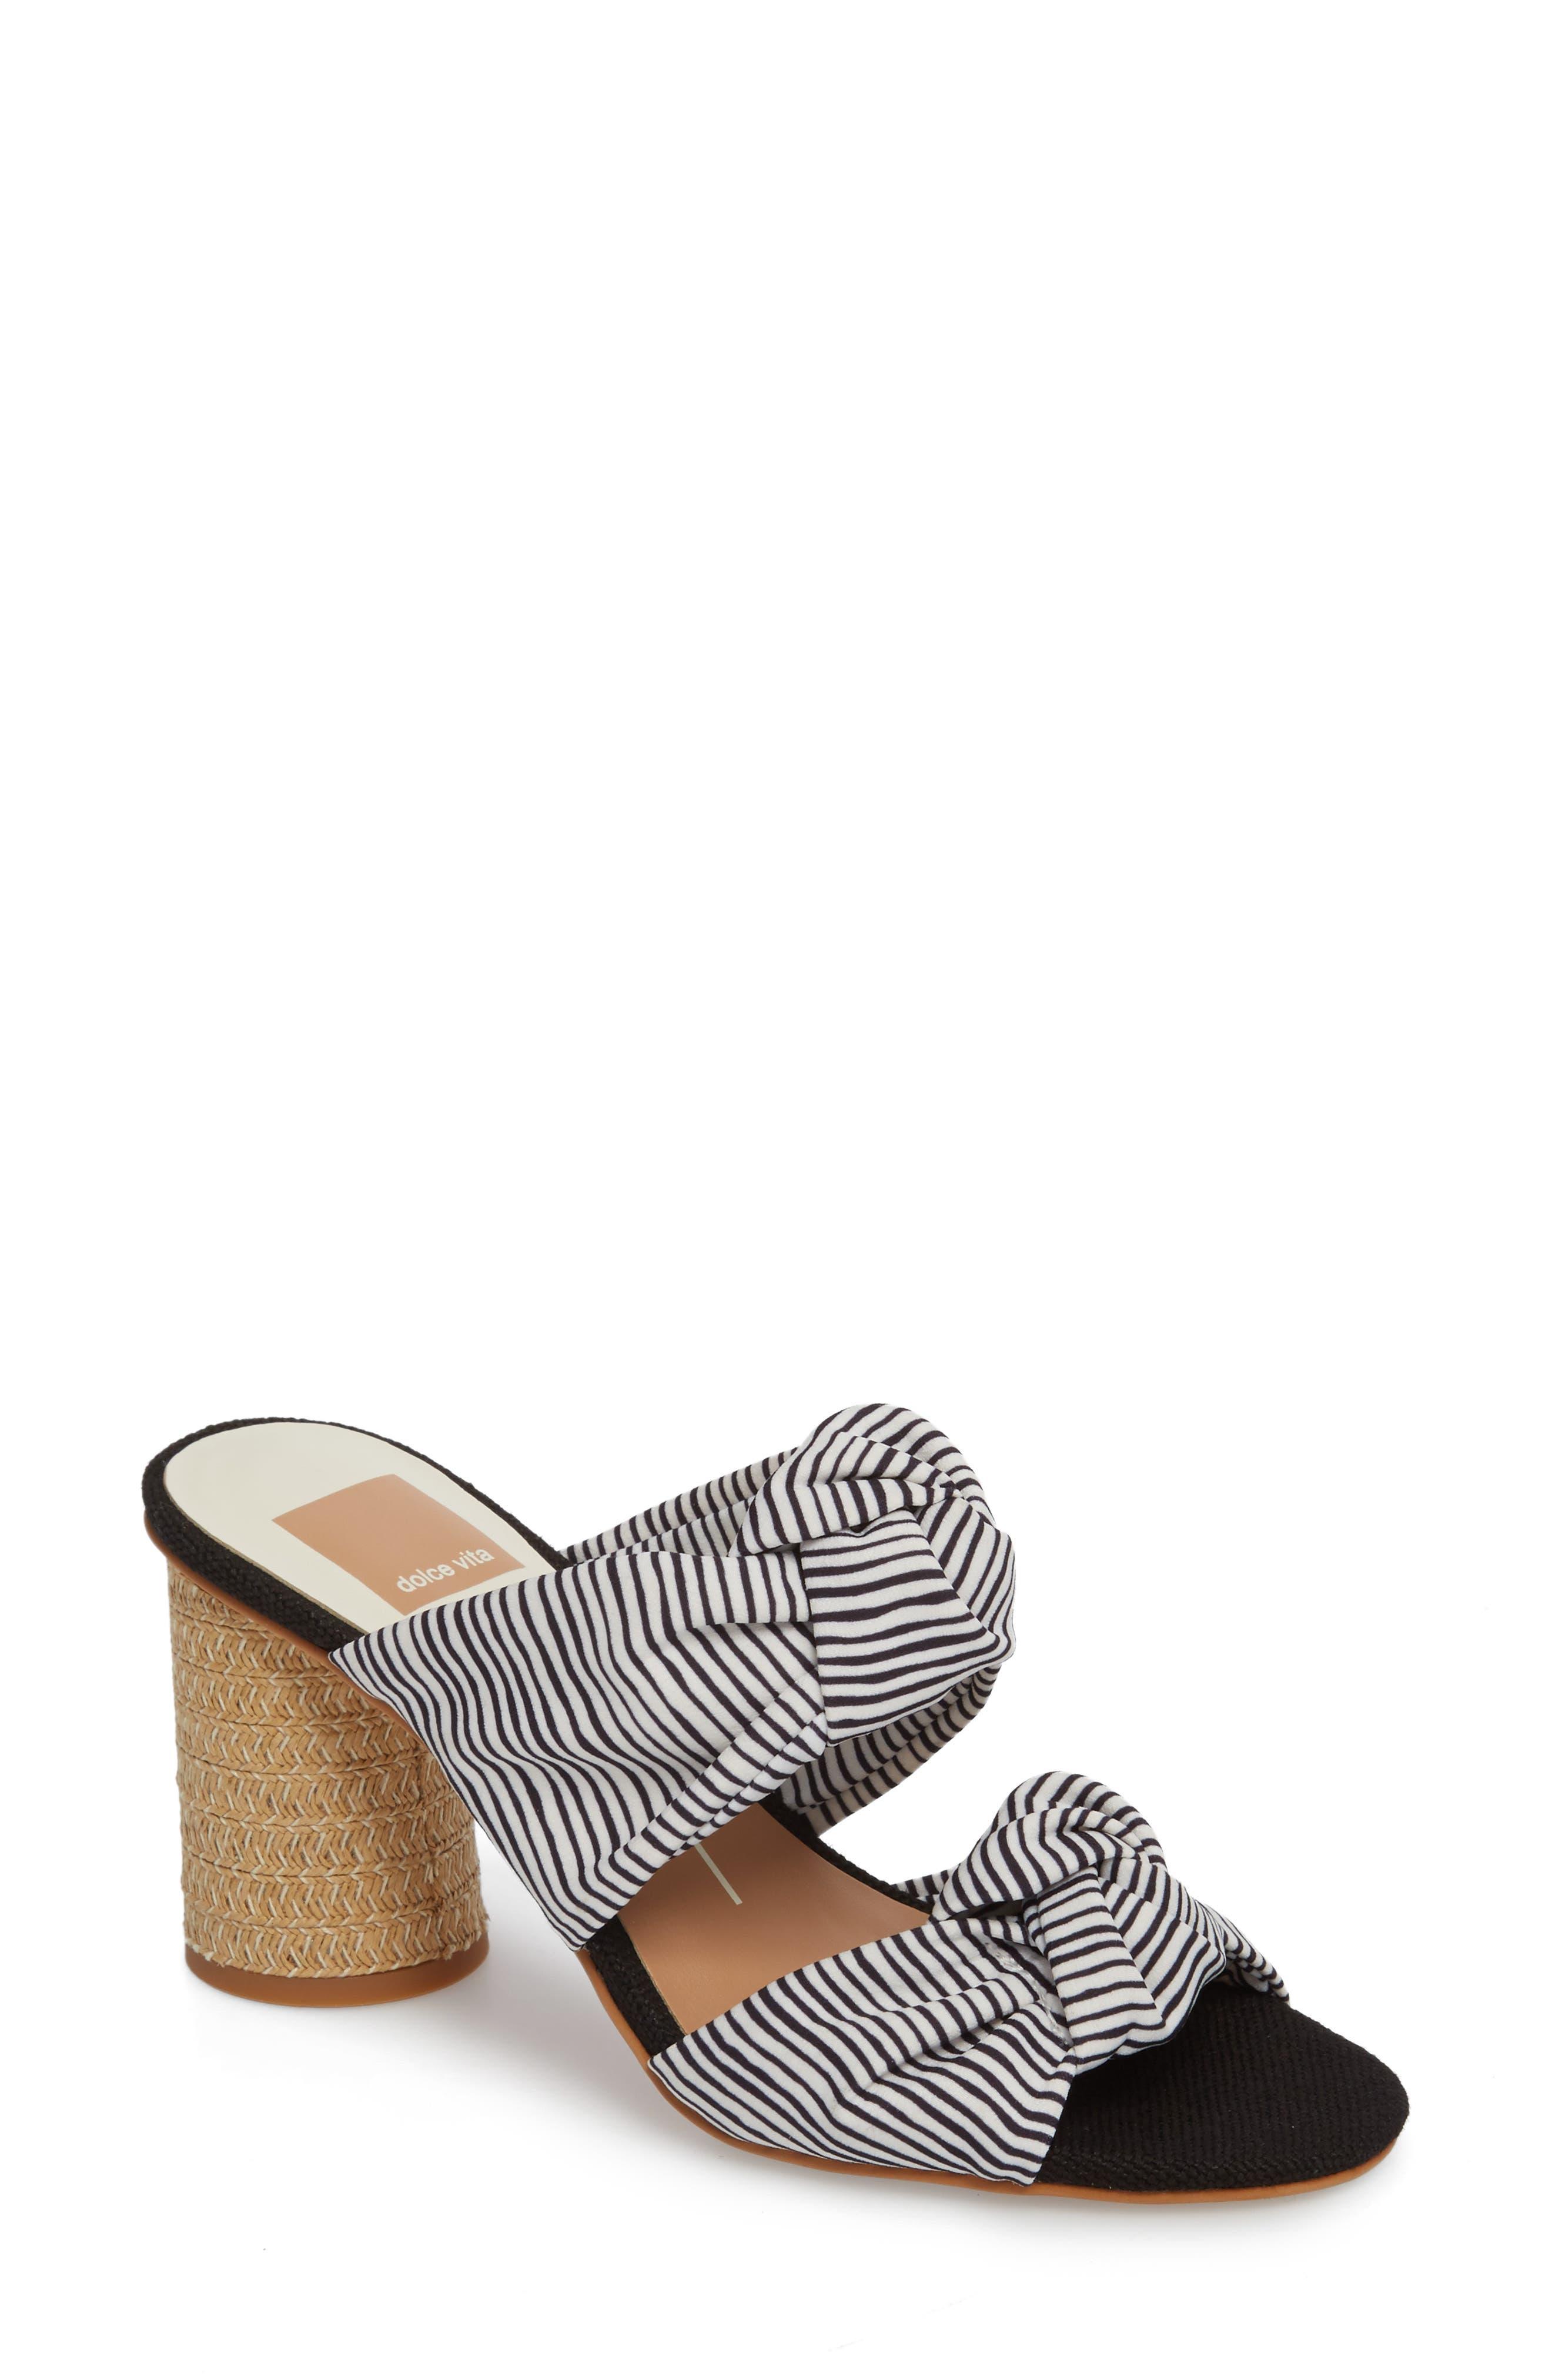 Dolce Vita Women's Jene Double Knot Sandal nJ4sjn3f